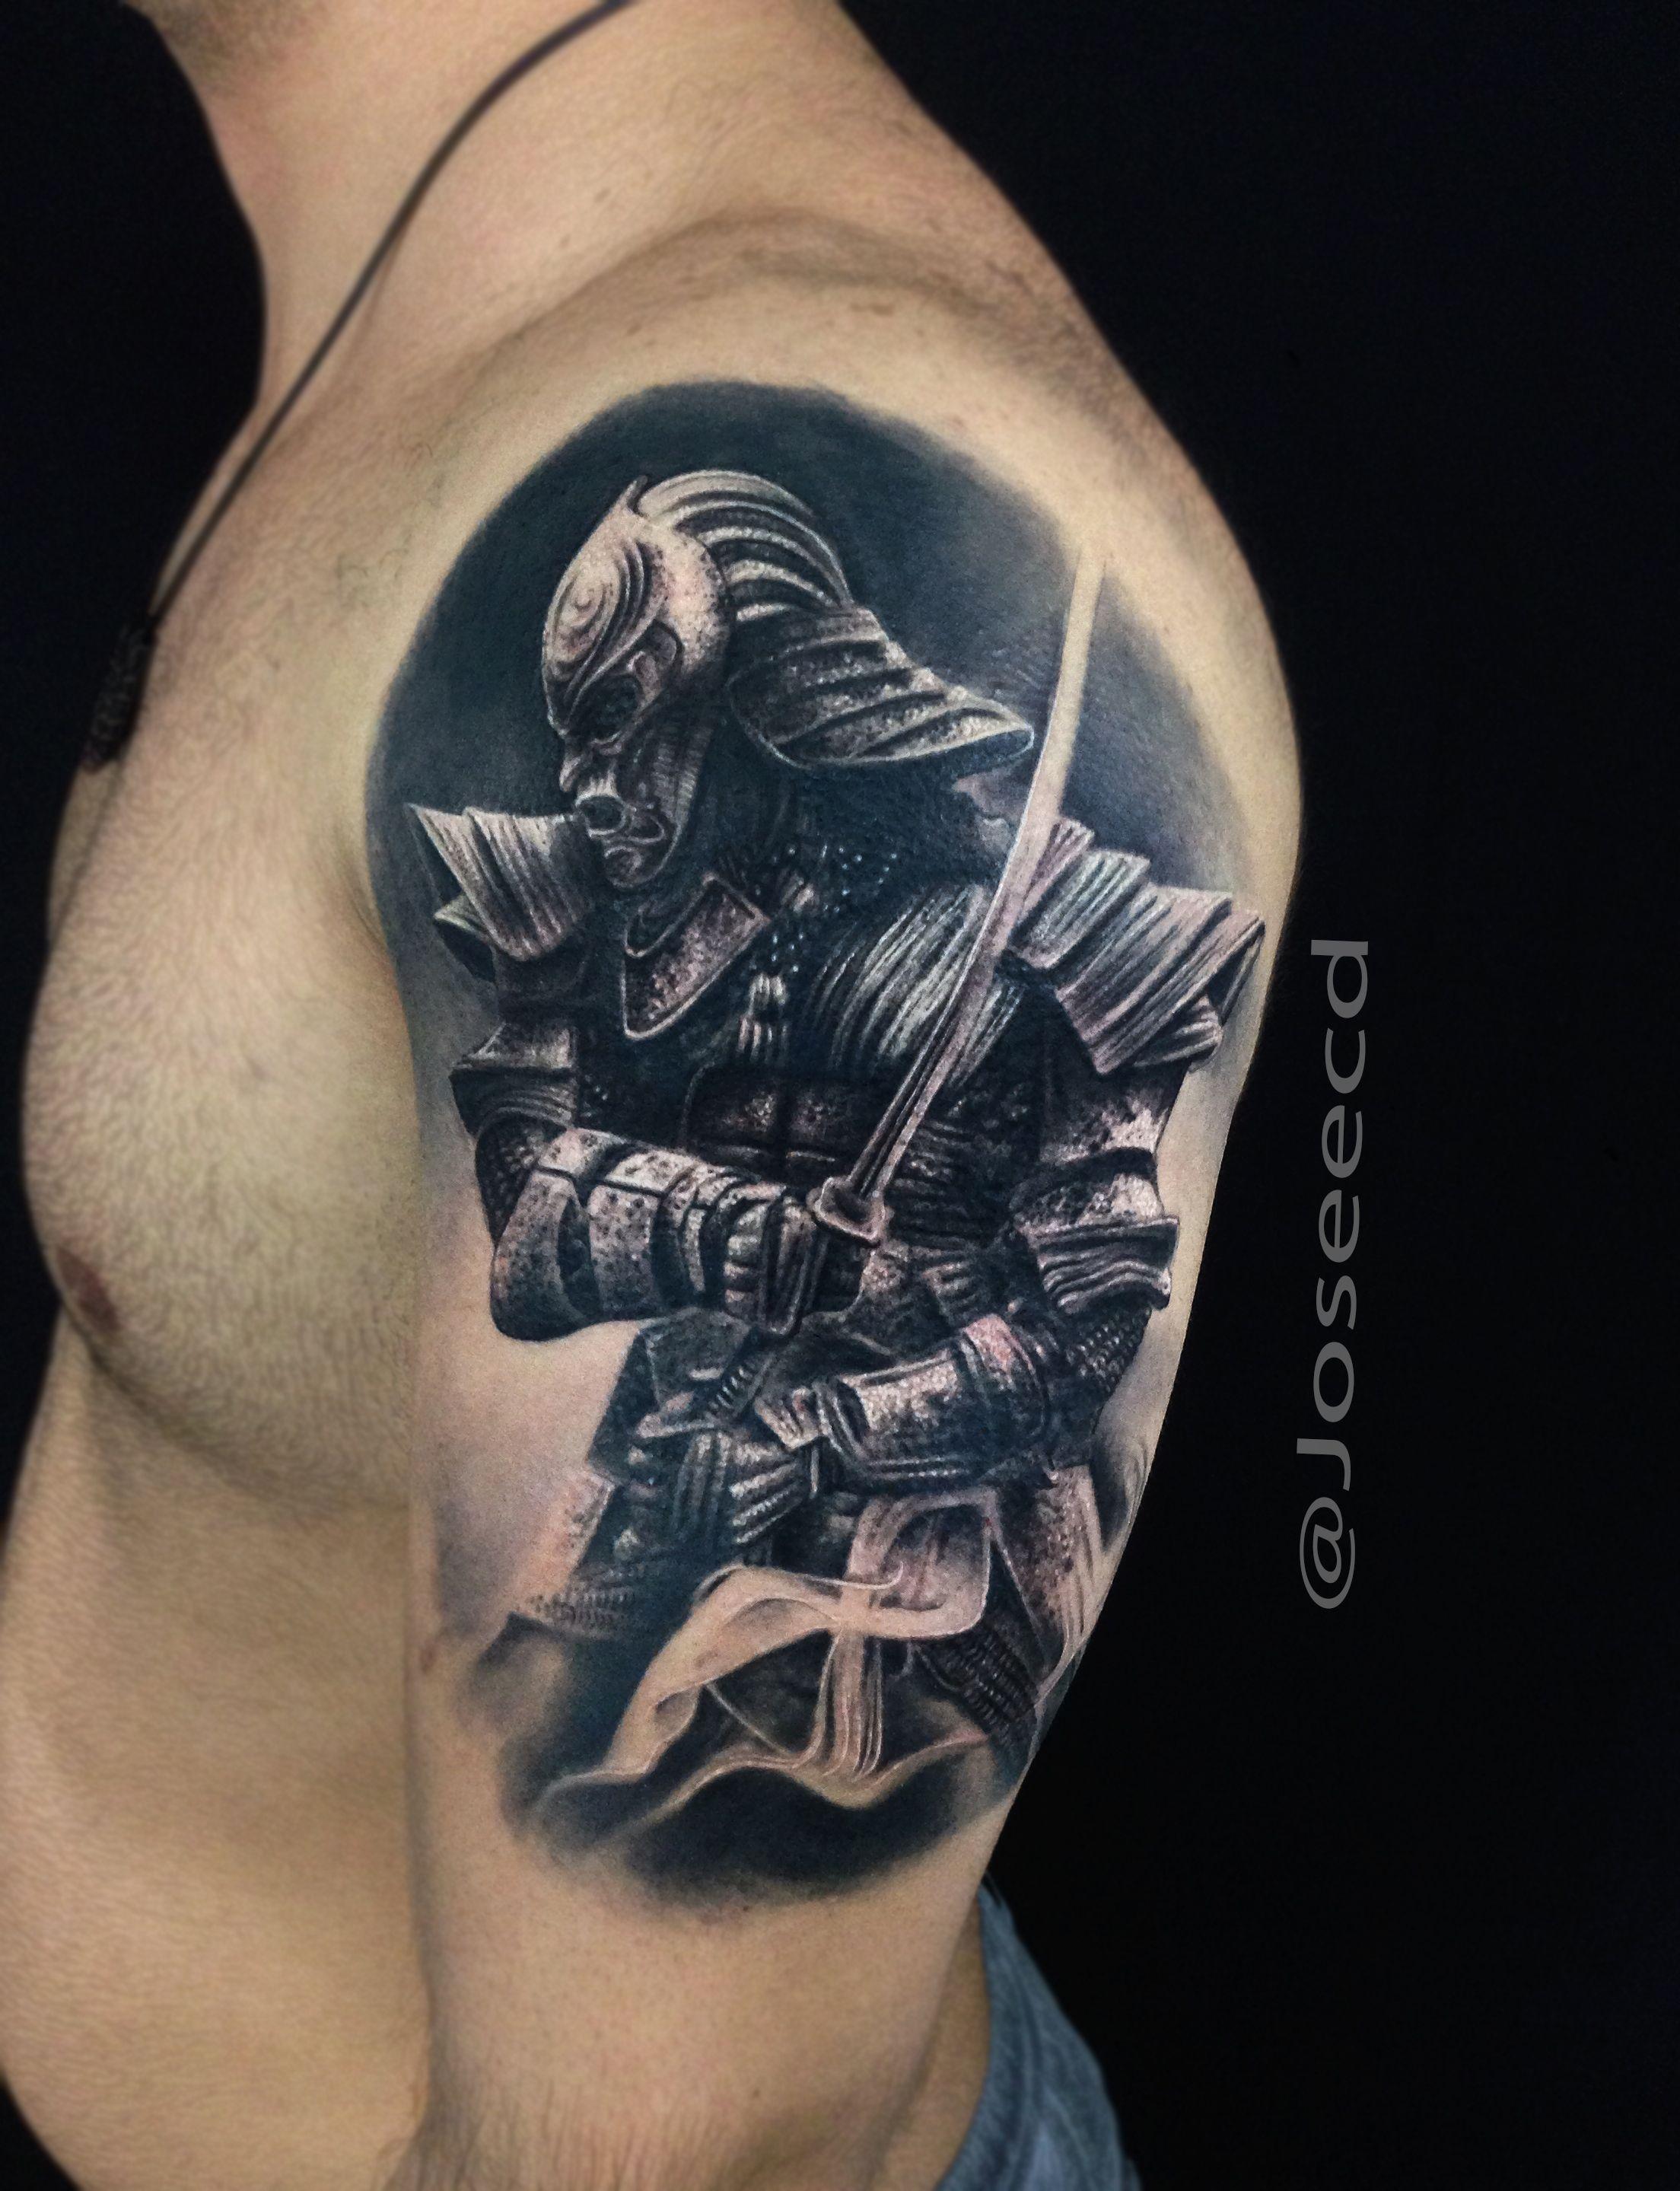 Tattoo-Inspiration-of-josecontreras-by-Jose-Contreras.jpg 2208×2879 pikseli